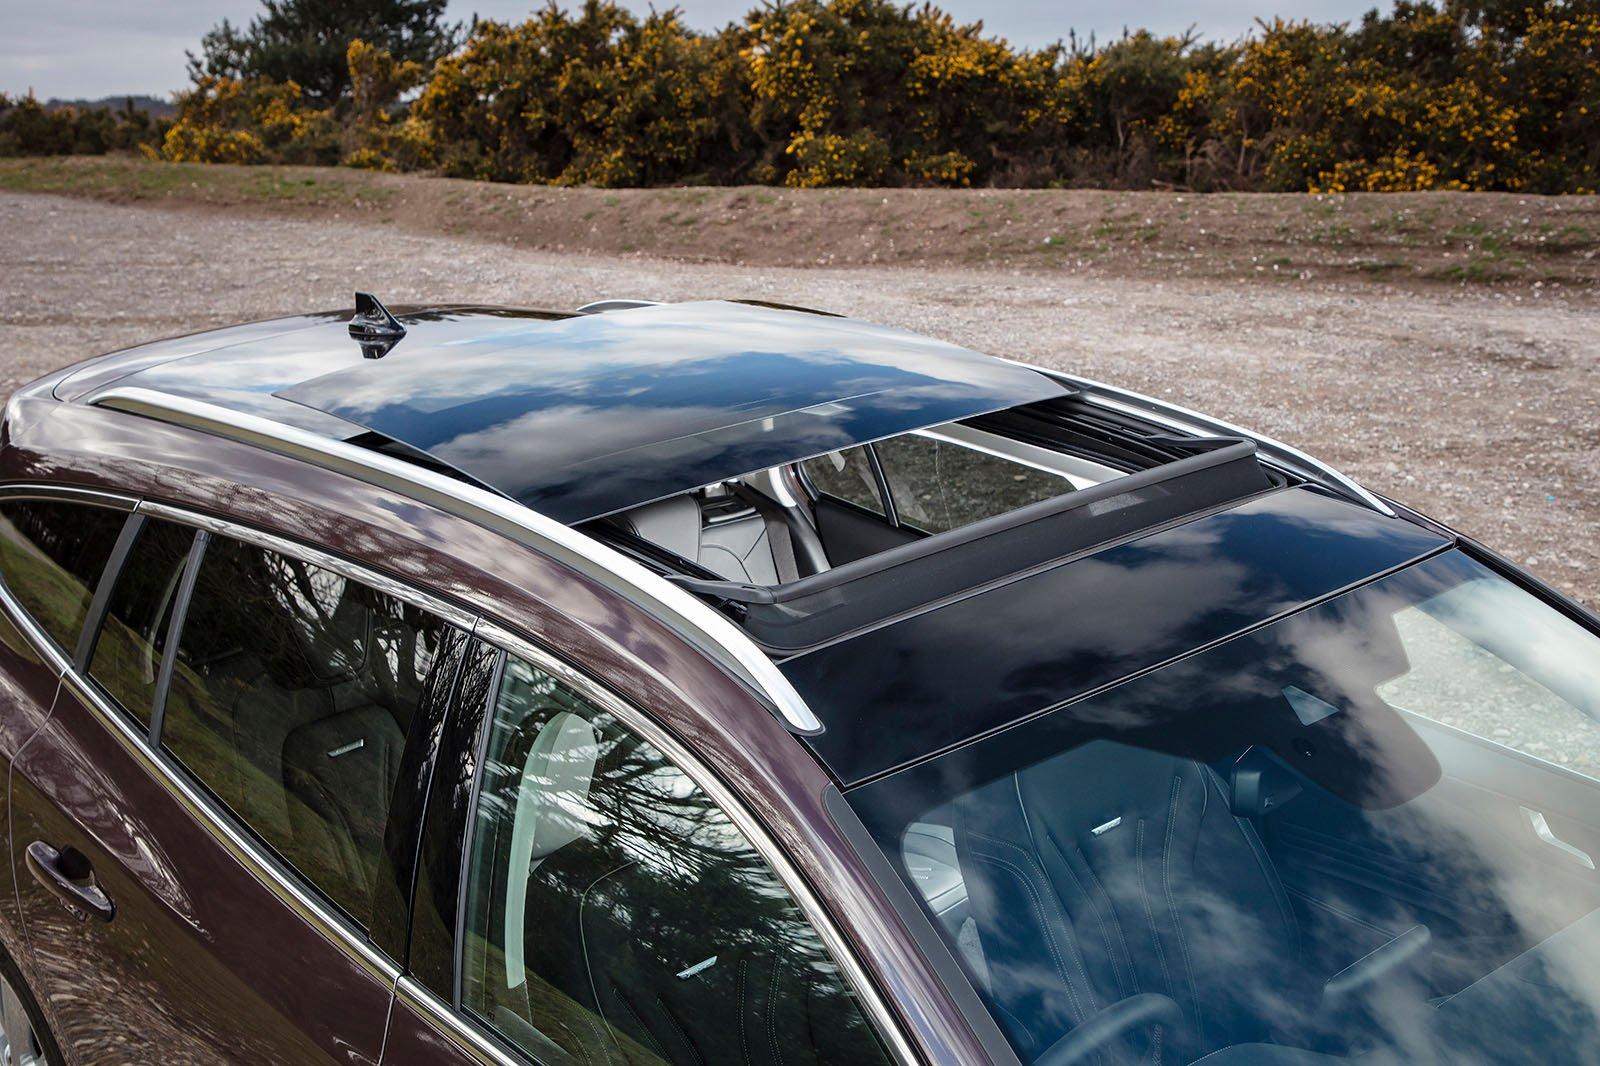 Ford Focus Estate 2019 panoramic roof